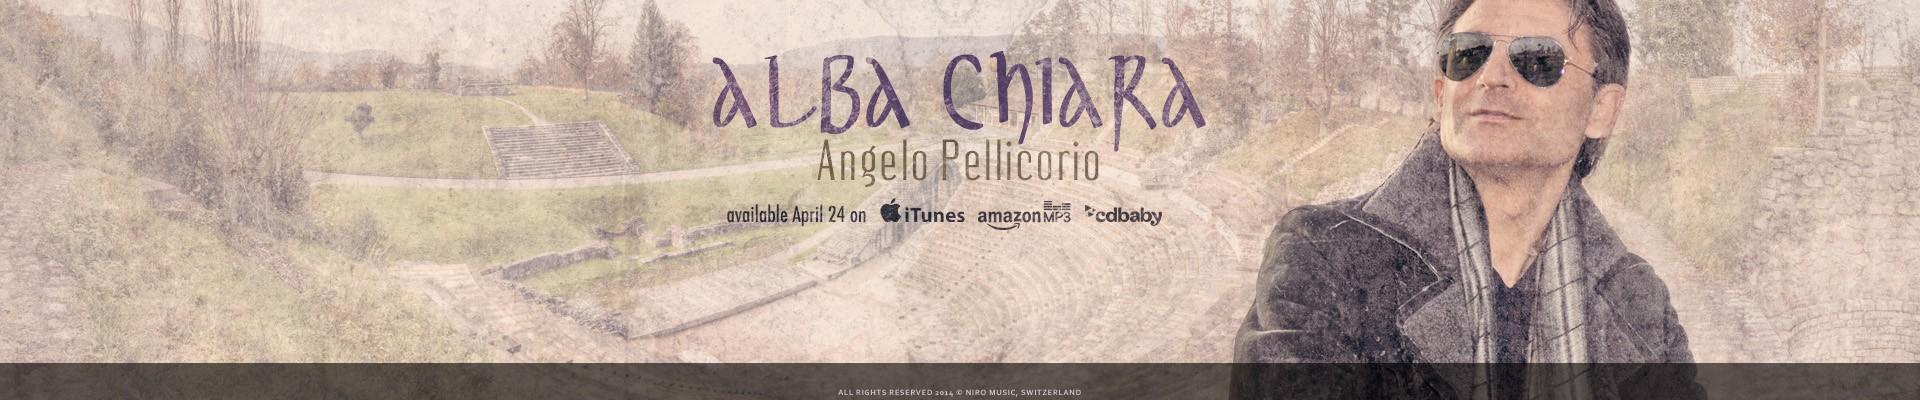 Angelo Pellicorio - Alba Chiara